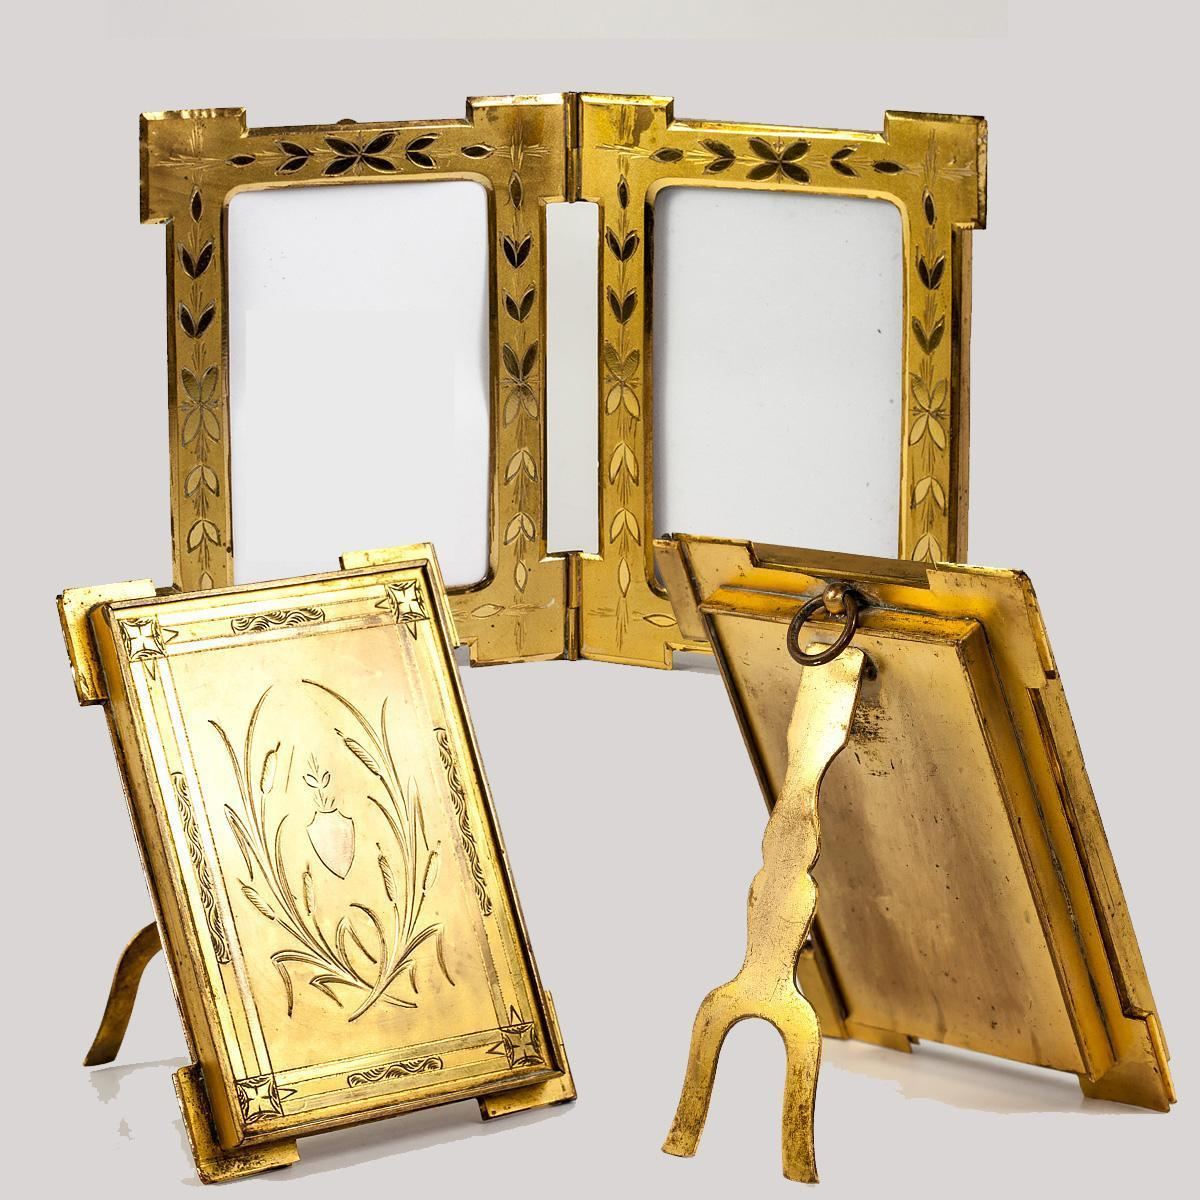 Antique French Dore Bronze Locket-Hinged Double Frame, Carte de Visite c.1860s